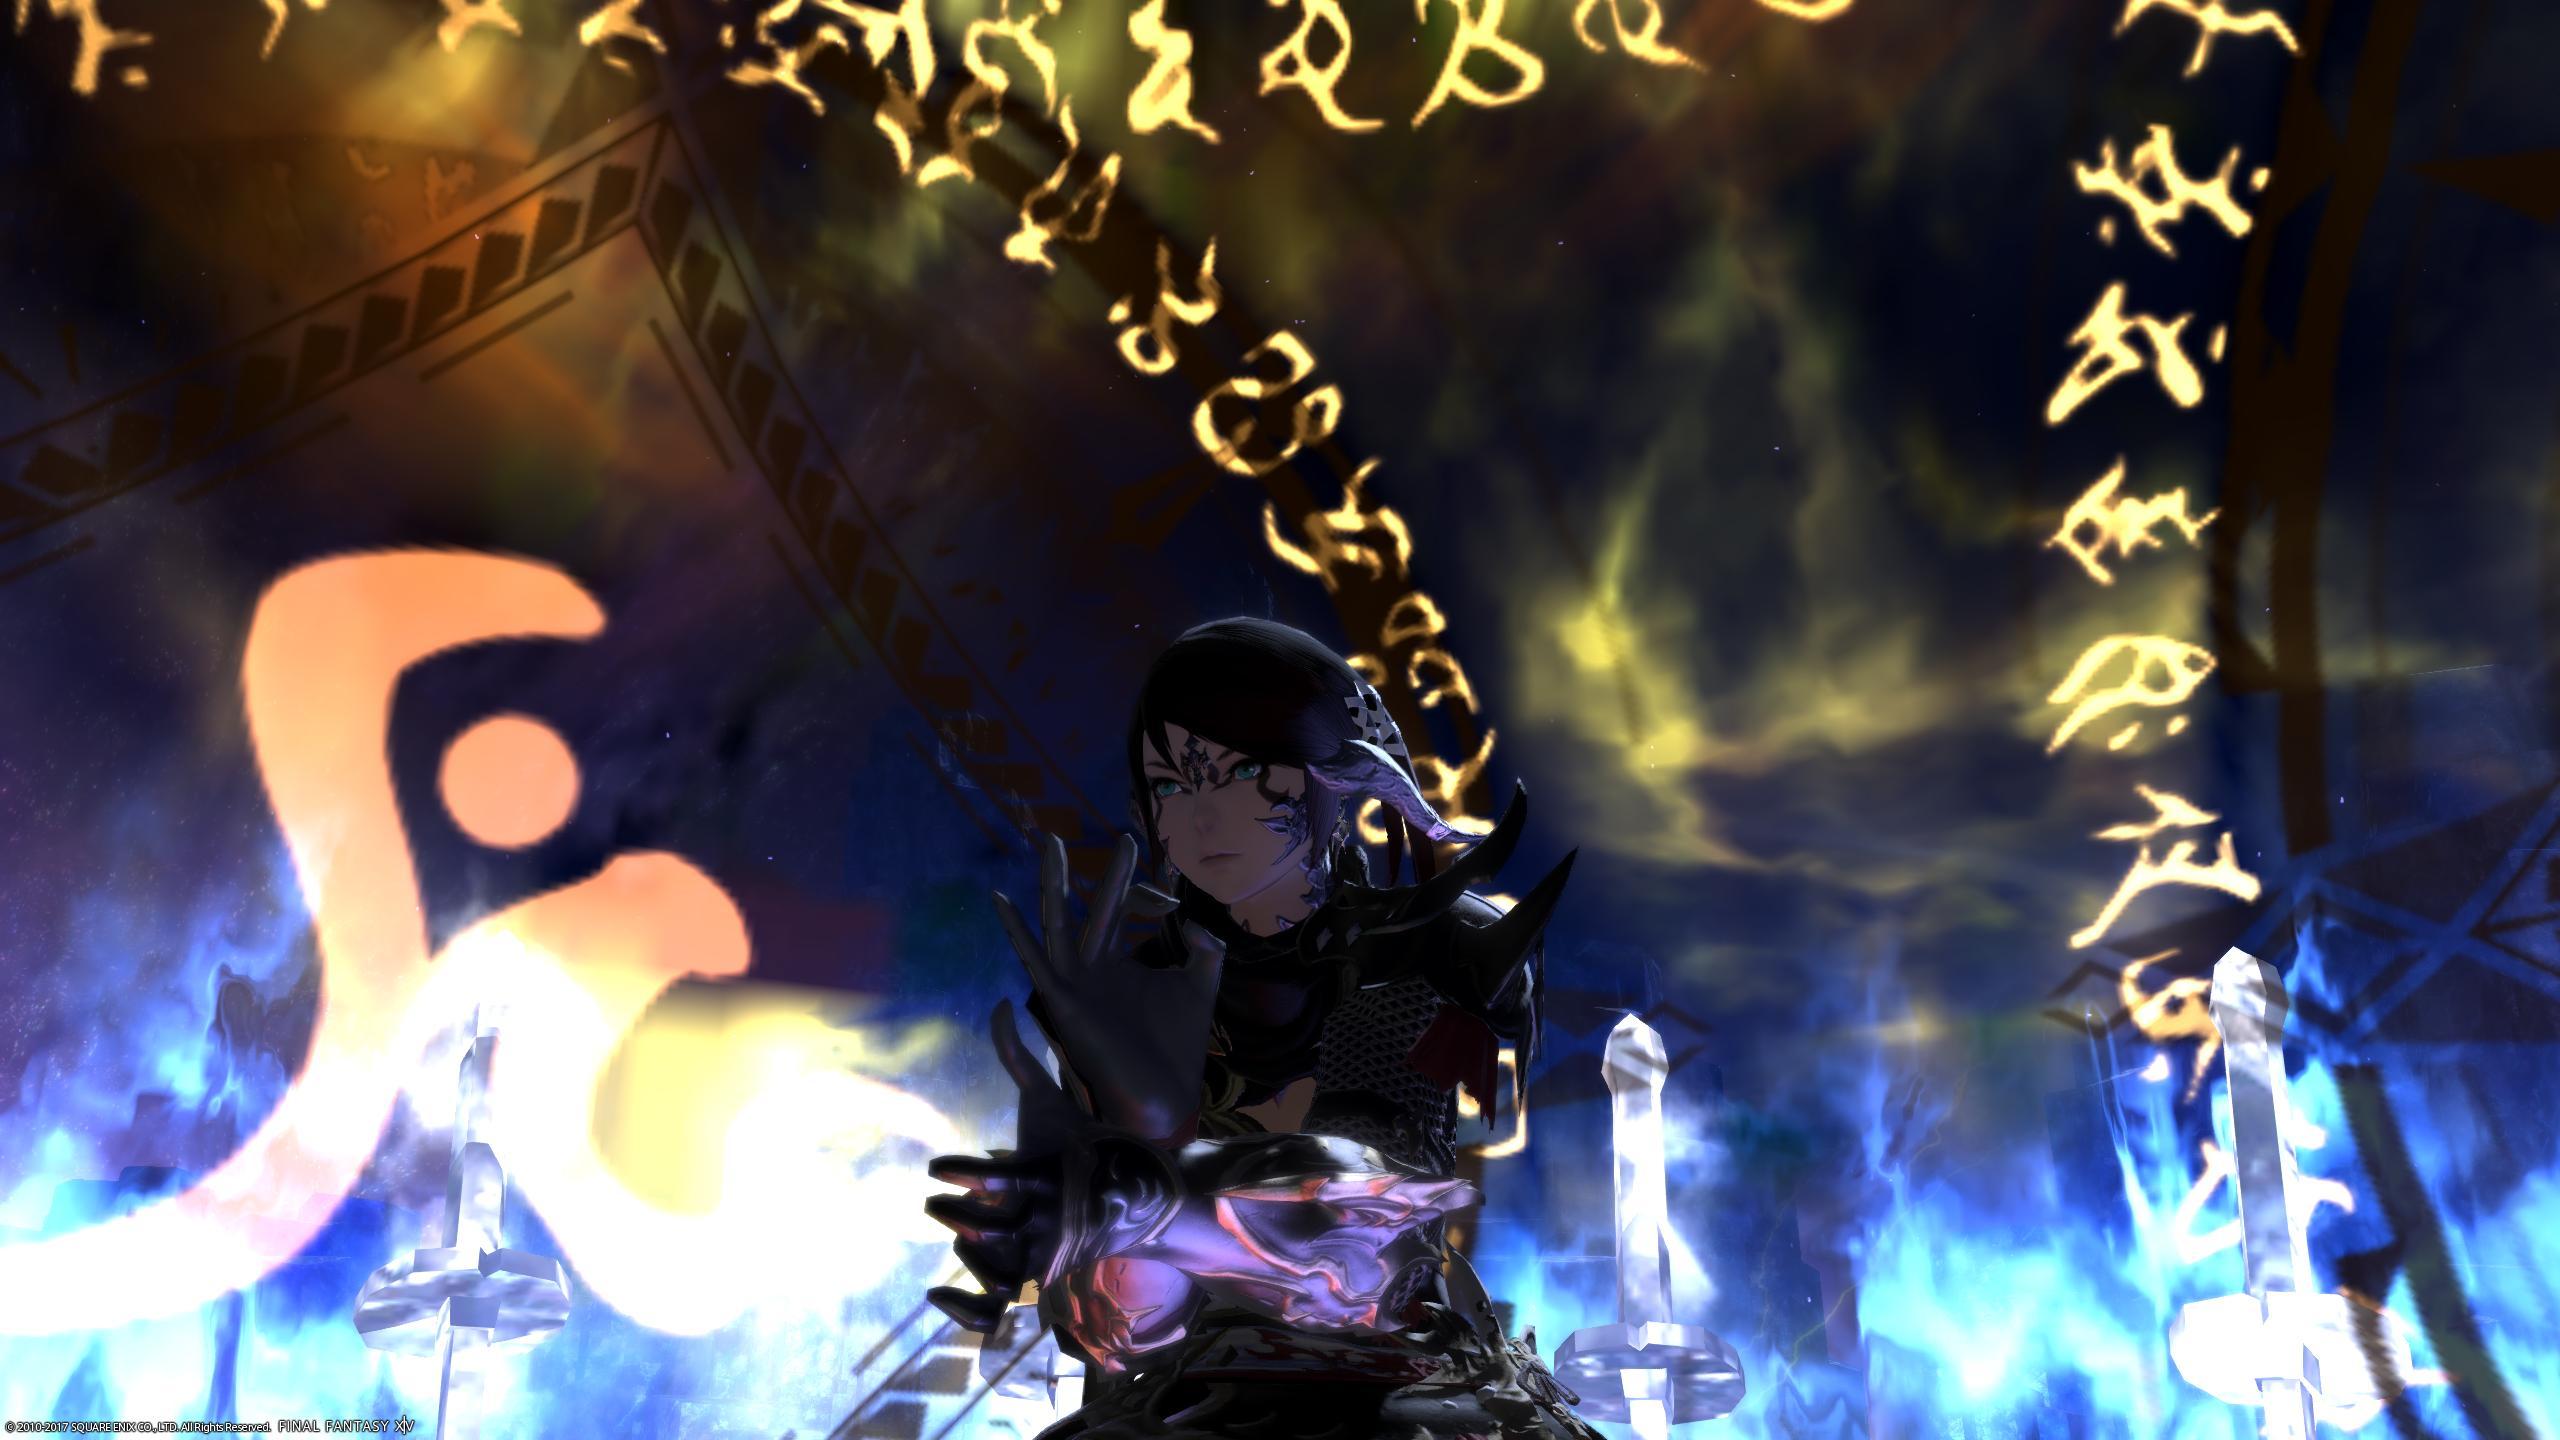 Final Fantasy XIV Shadowbringers ปล่อยตัวทดสอบเกม ฉลองยอดผู้เล่น 16